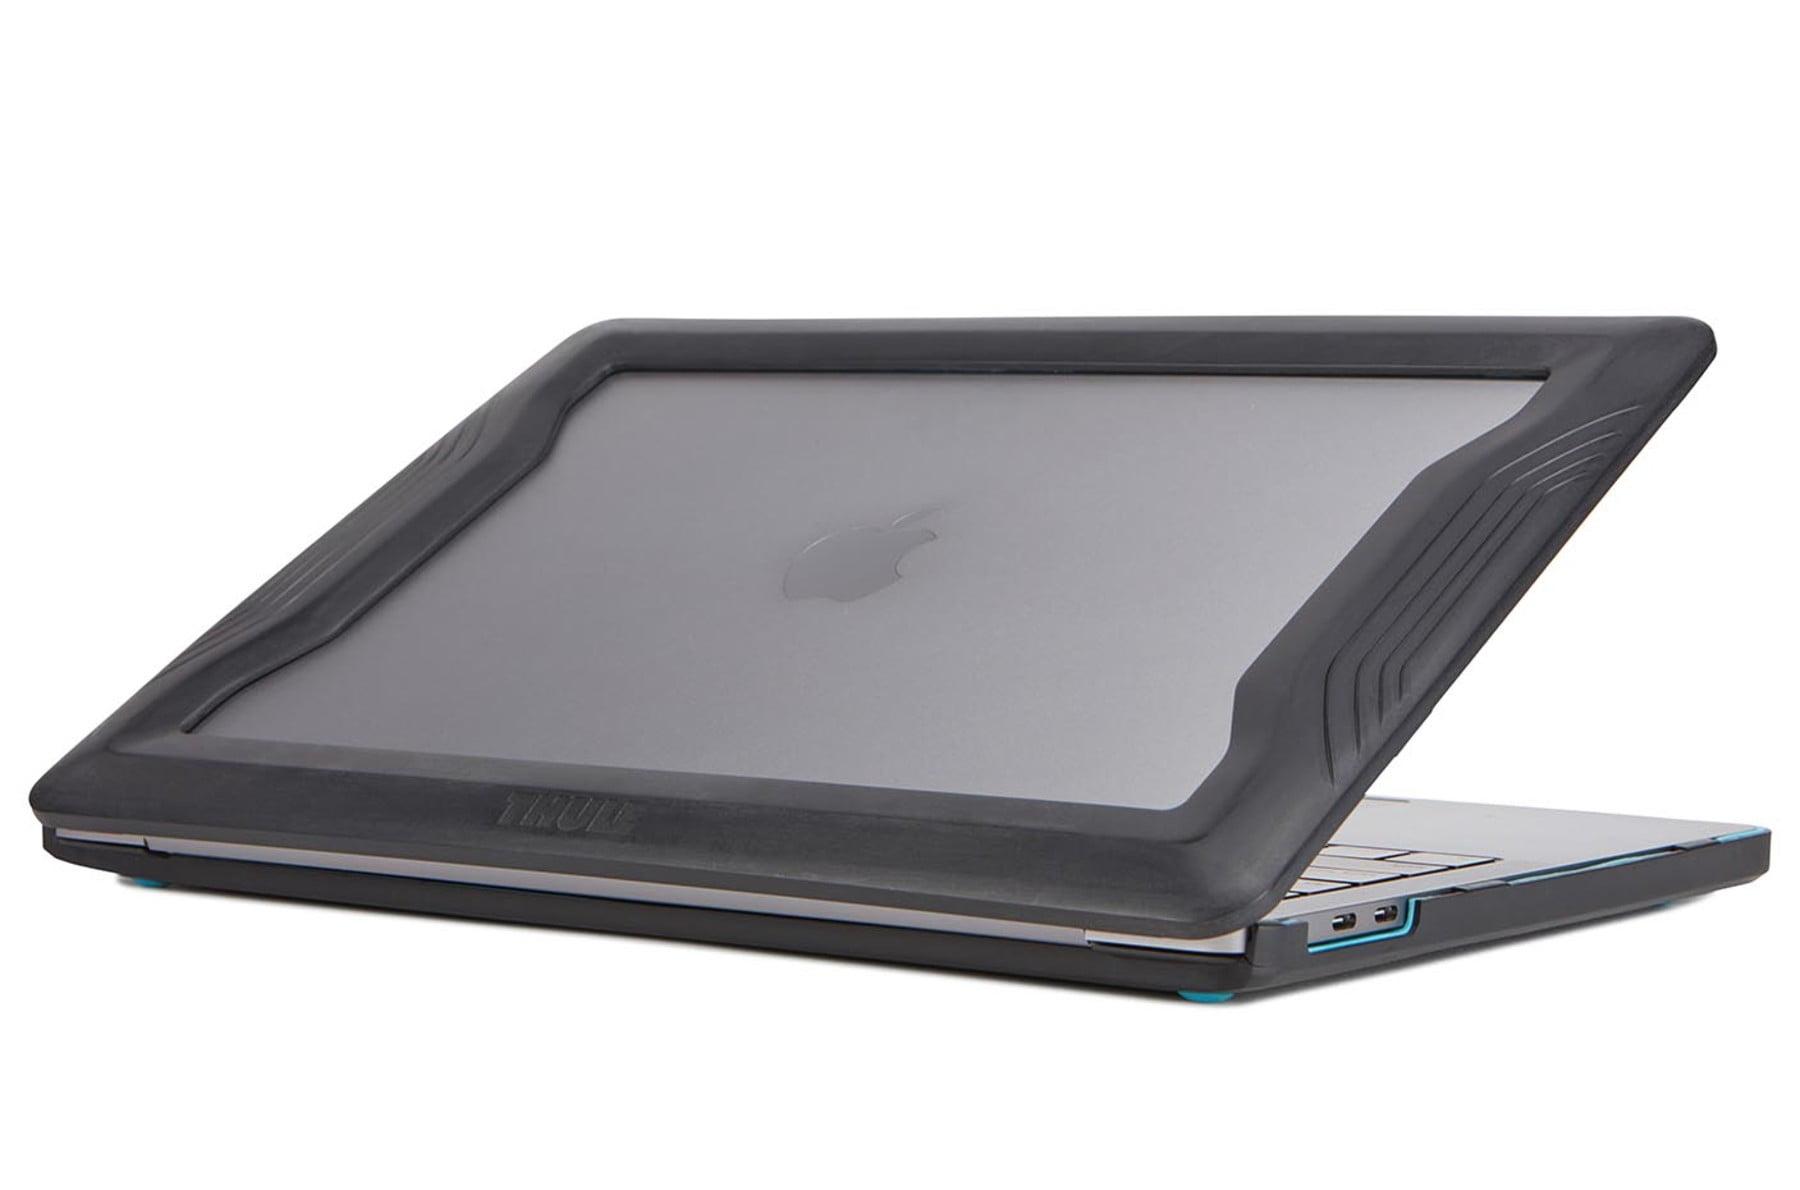 Carcasa laptop Thule Vectros Protective Bumper 13 MacBook Pro Retina 1